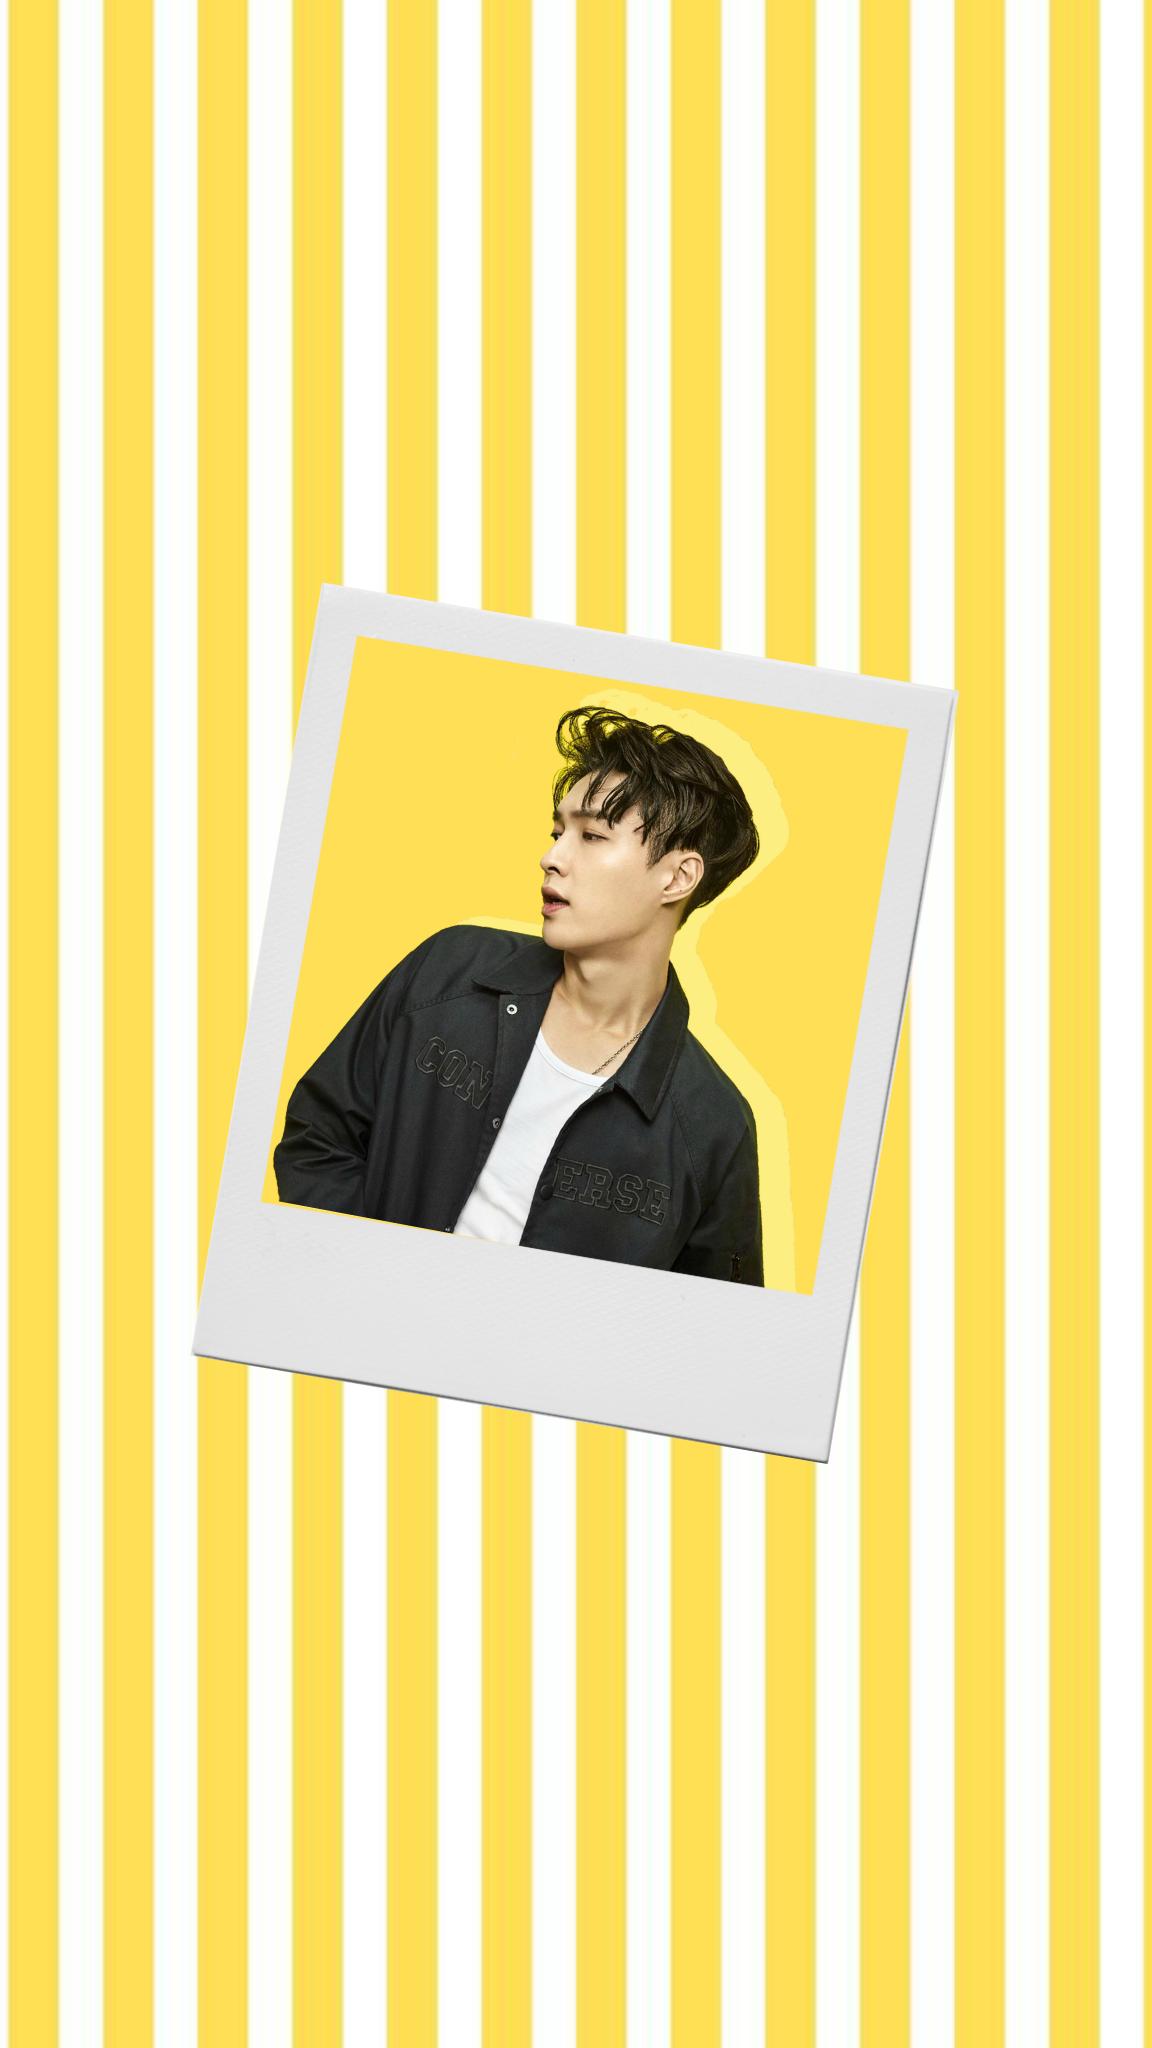 exo yixing polaroid wallpaper yellow kpop wallpapers